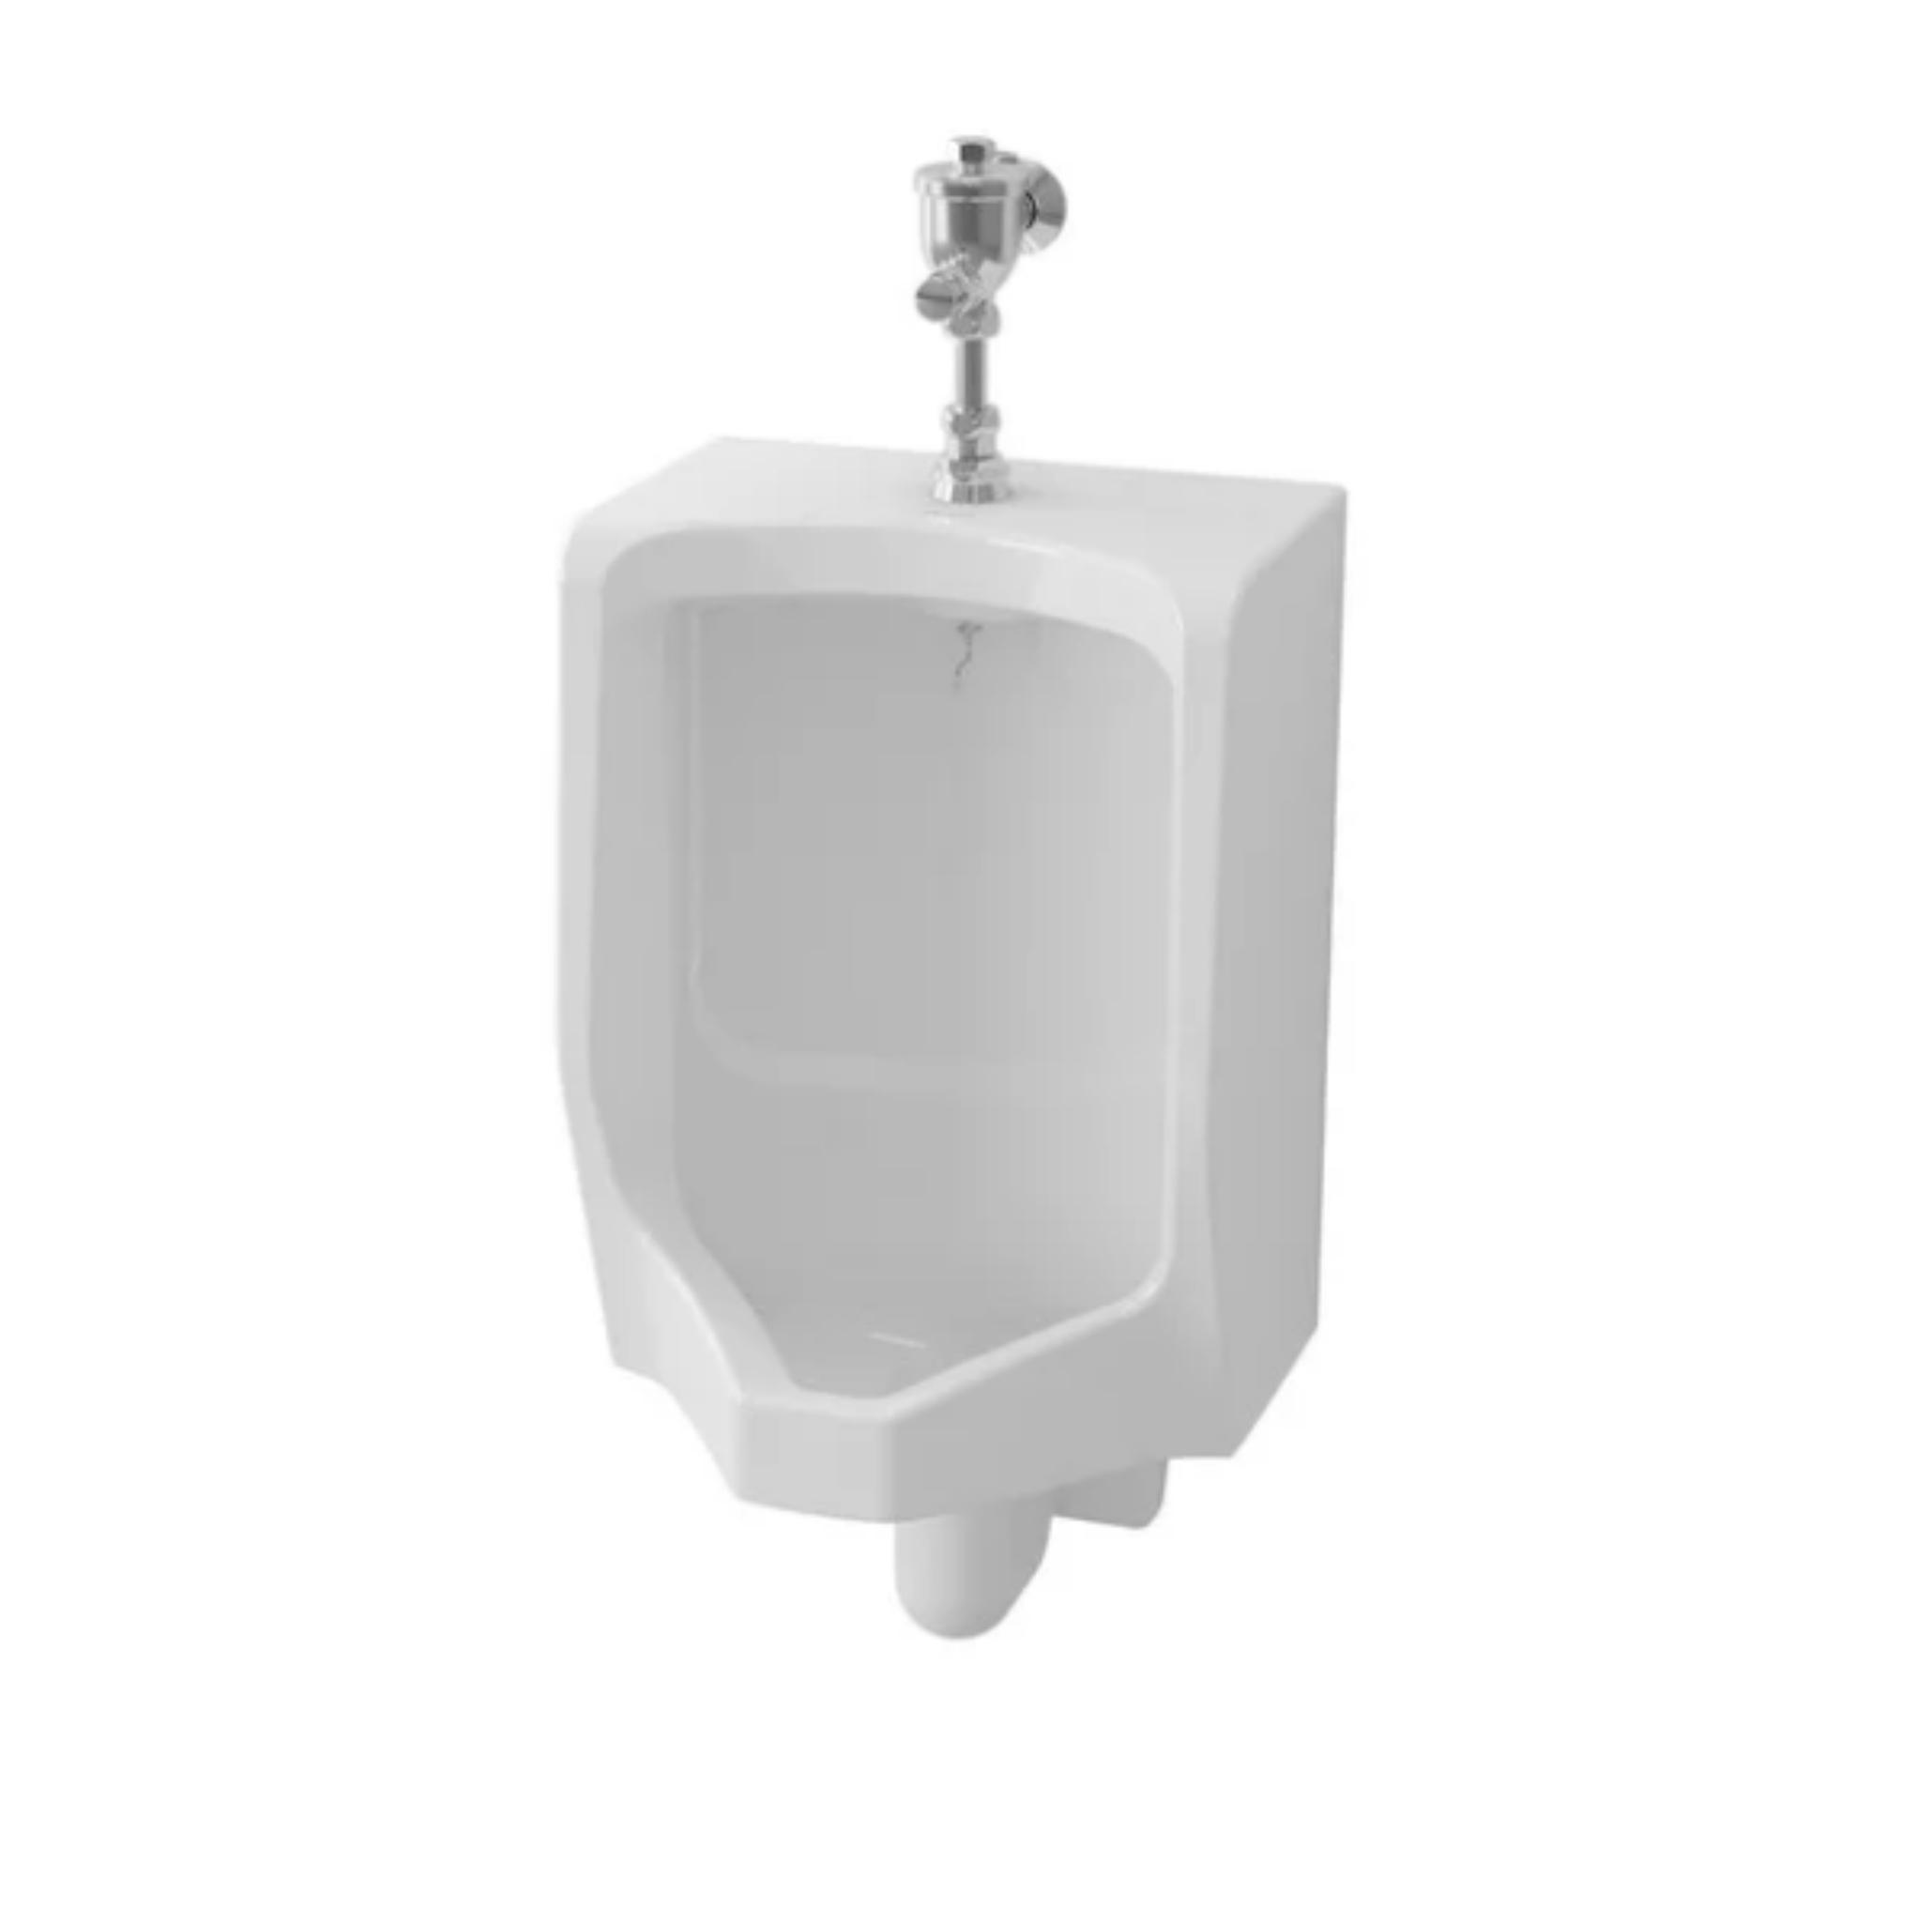 toto urinal di depo zahra bangunan